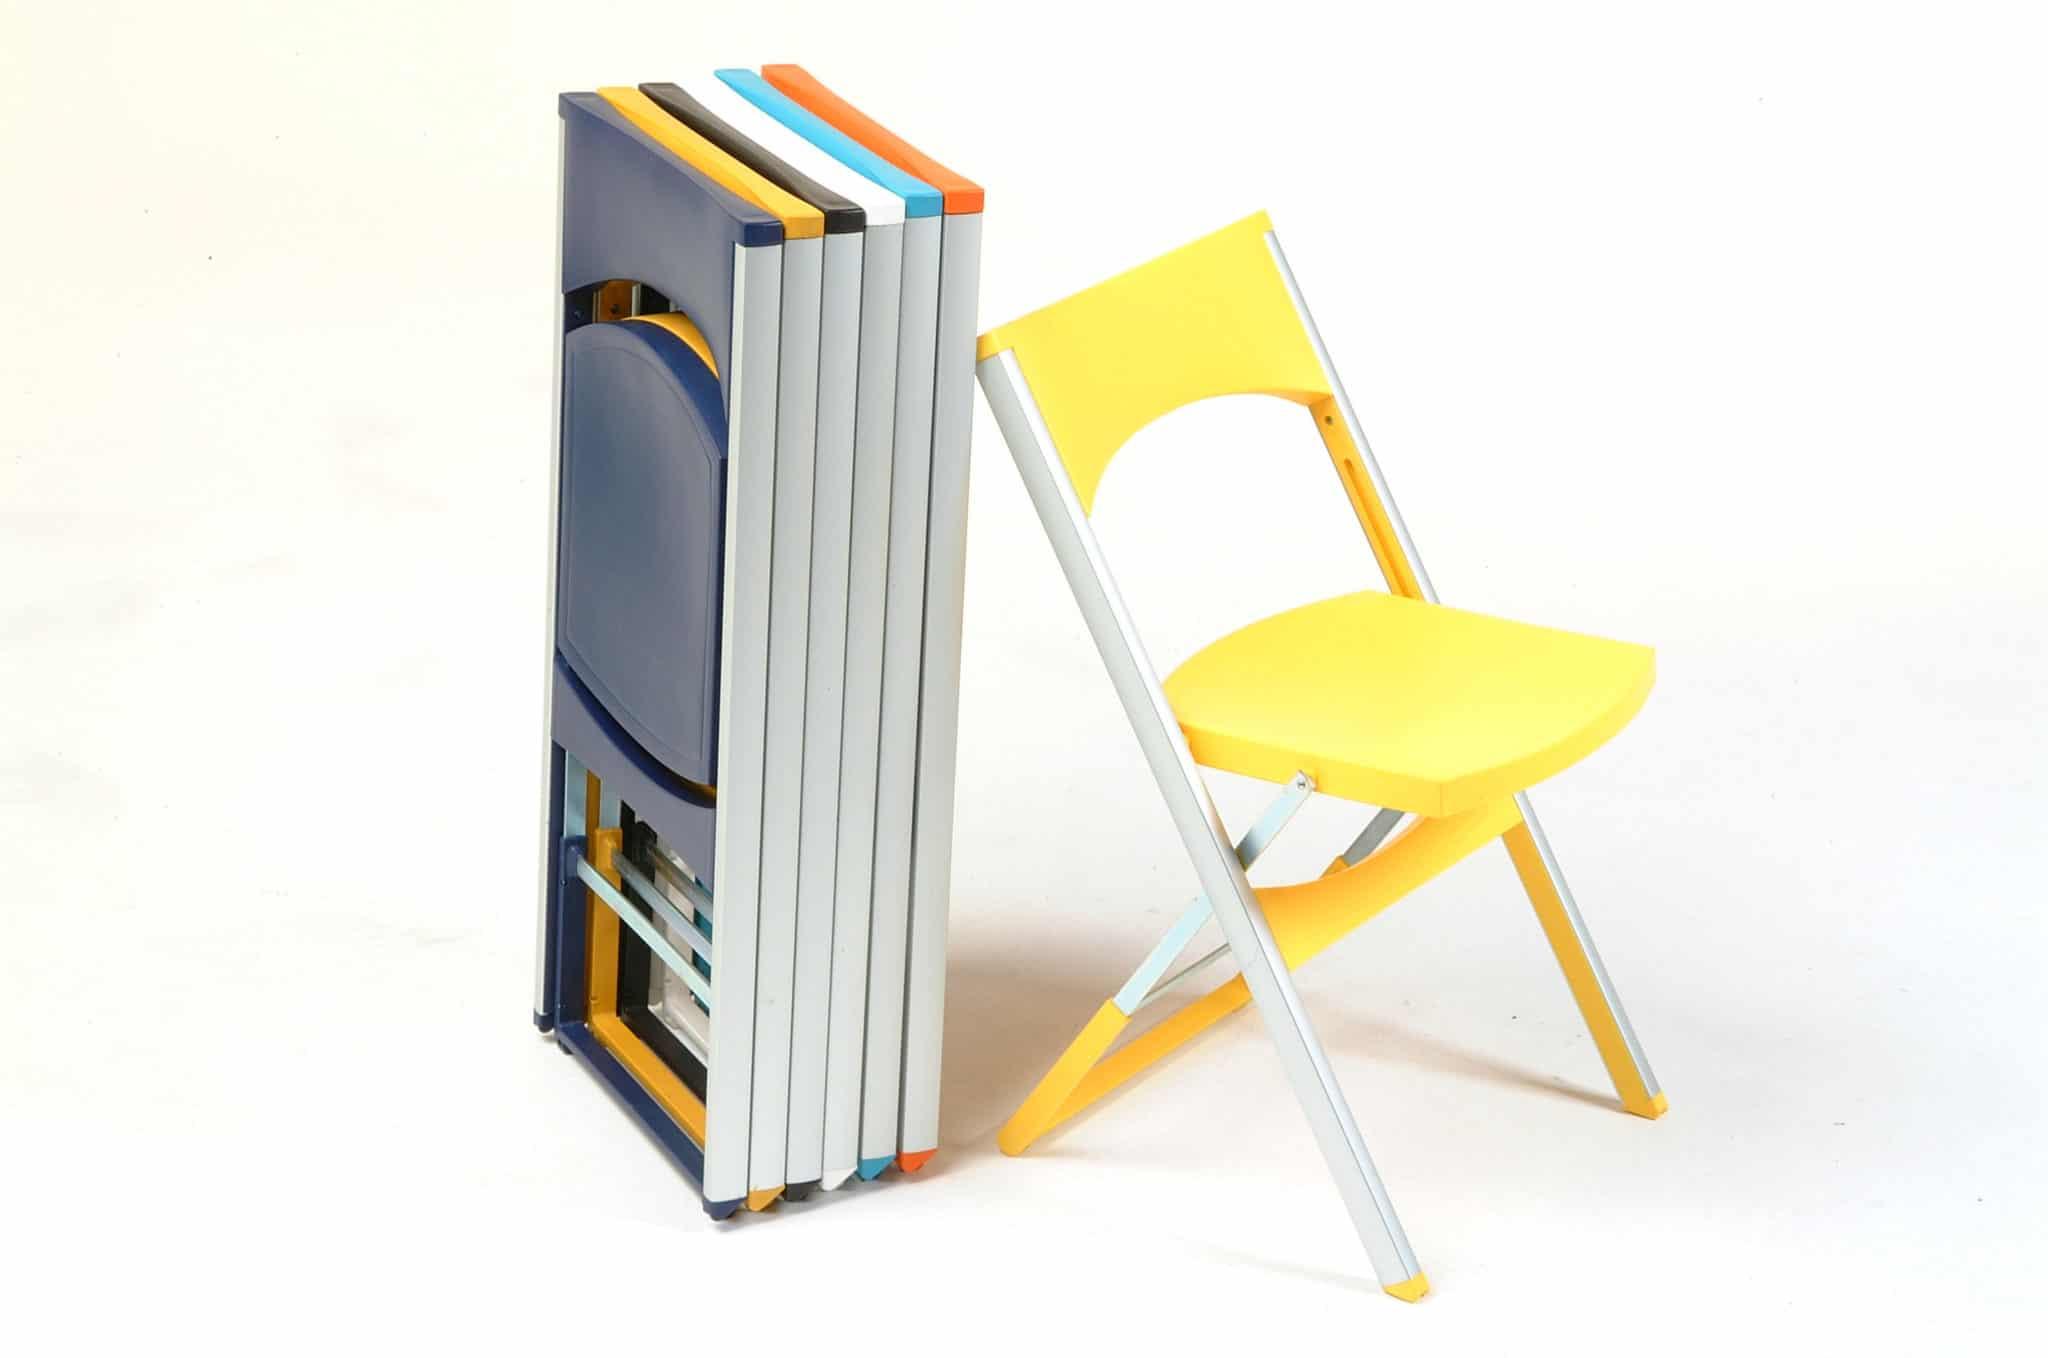 Compact, indoor, outdoor, stacking, modern, simple